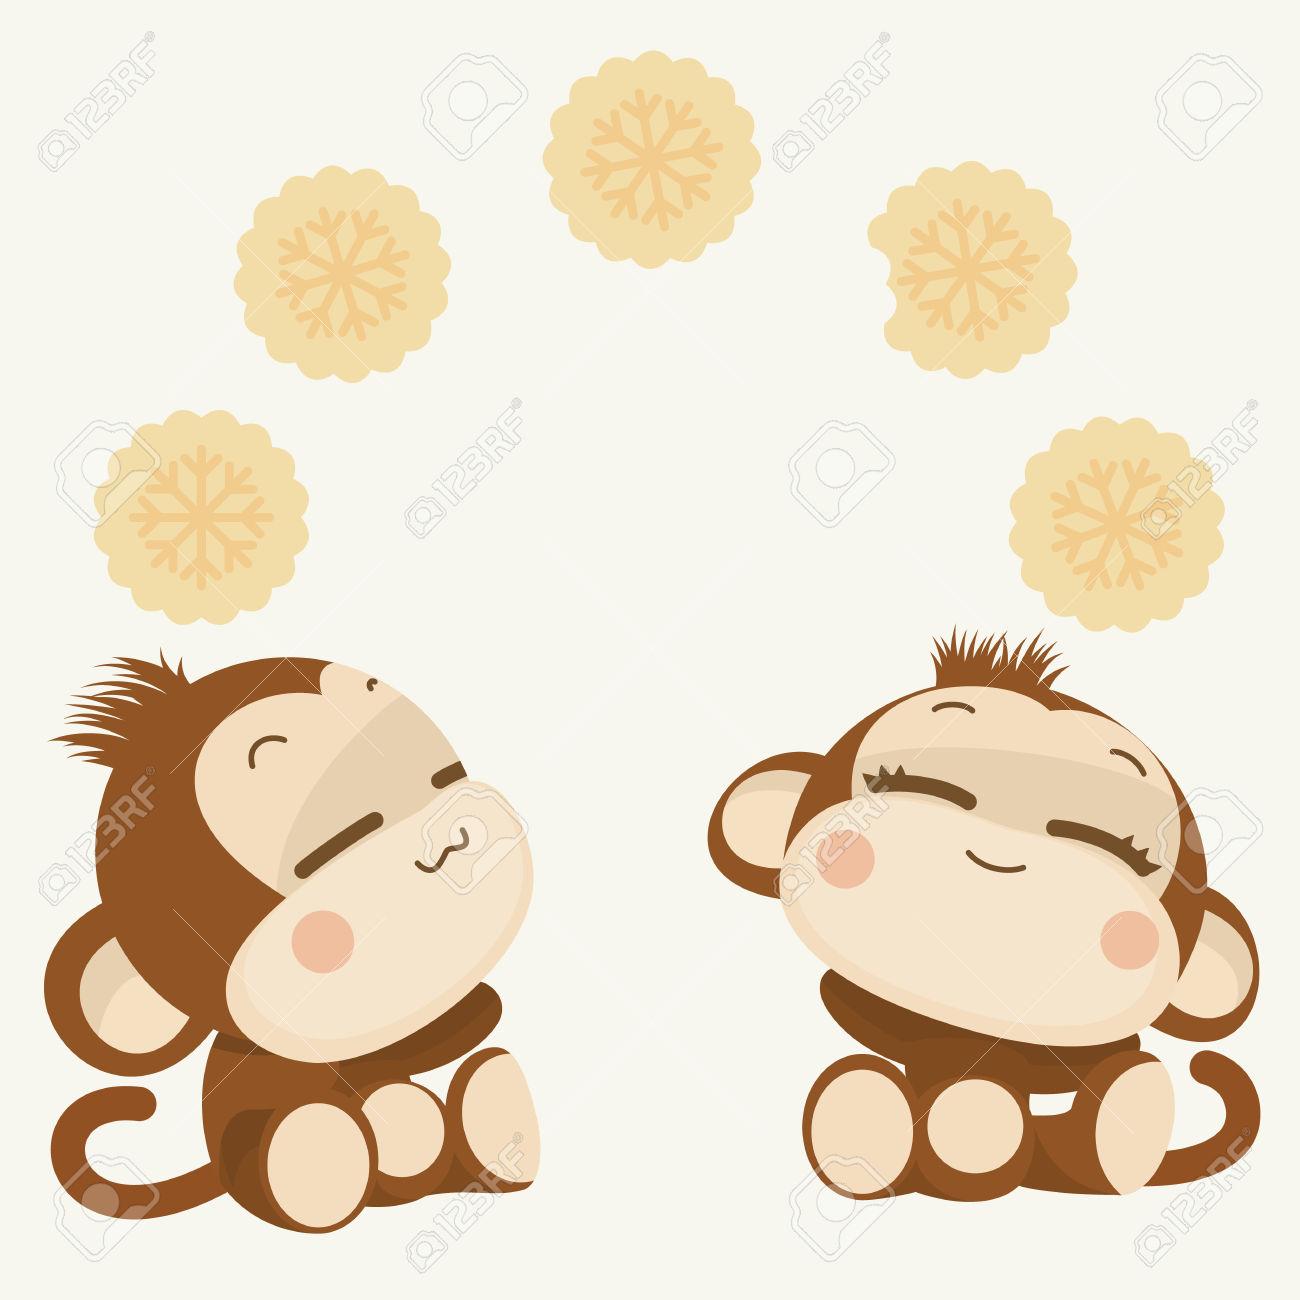 Kopel clipart monkey Cute Couple New New Lovely